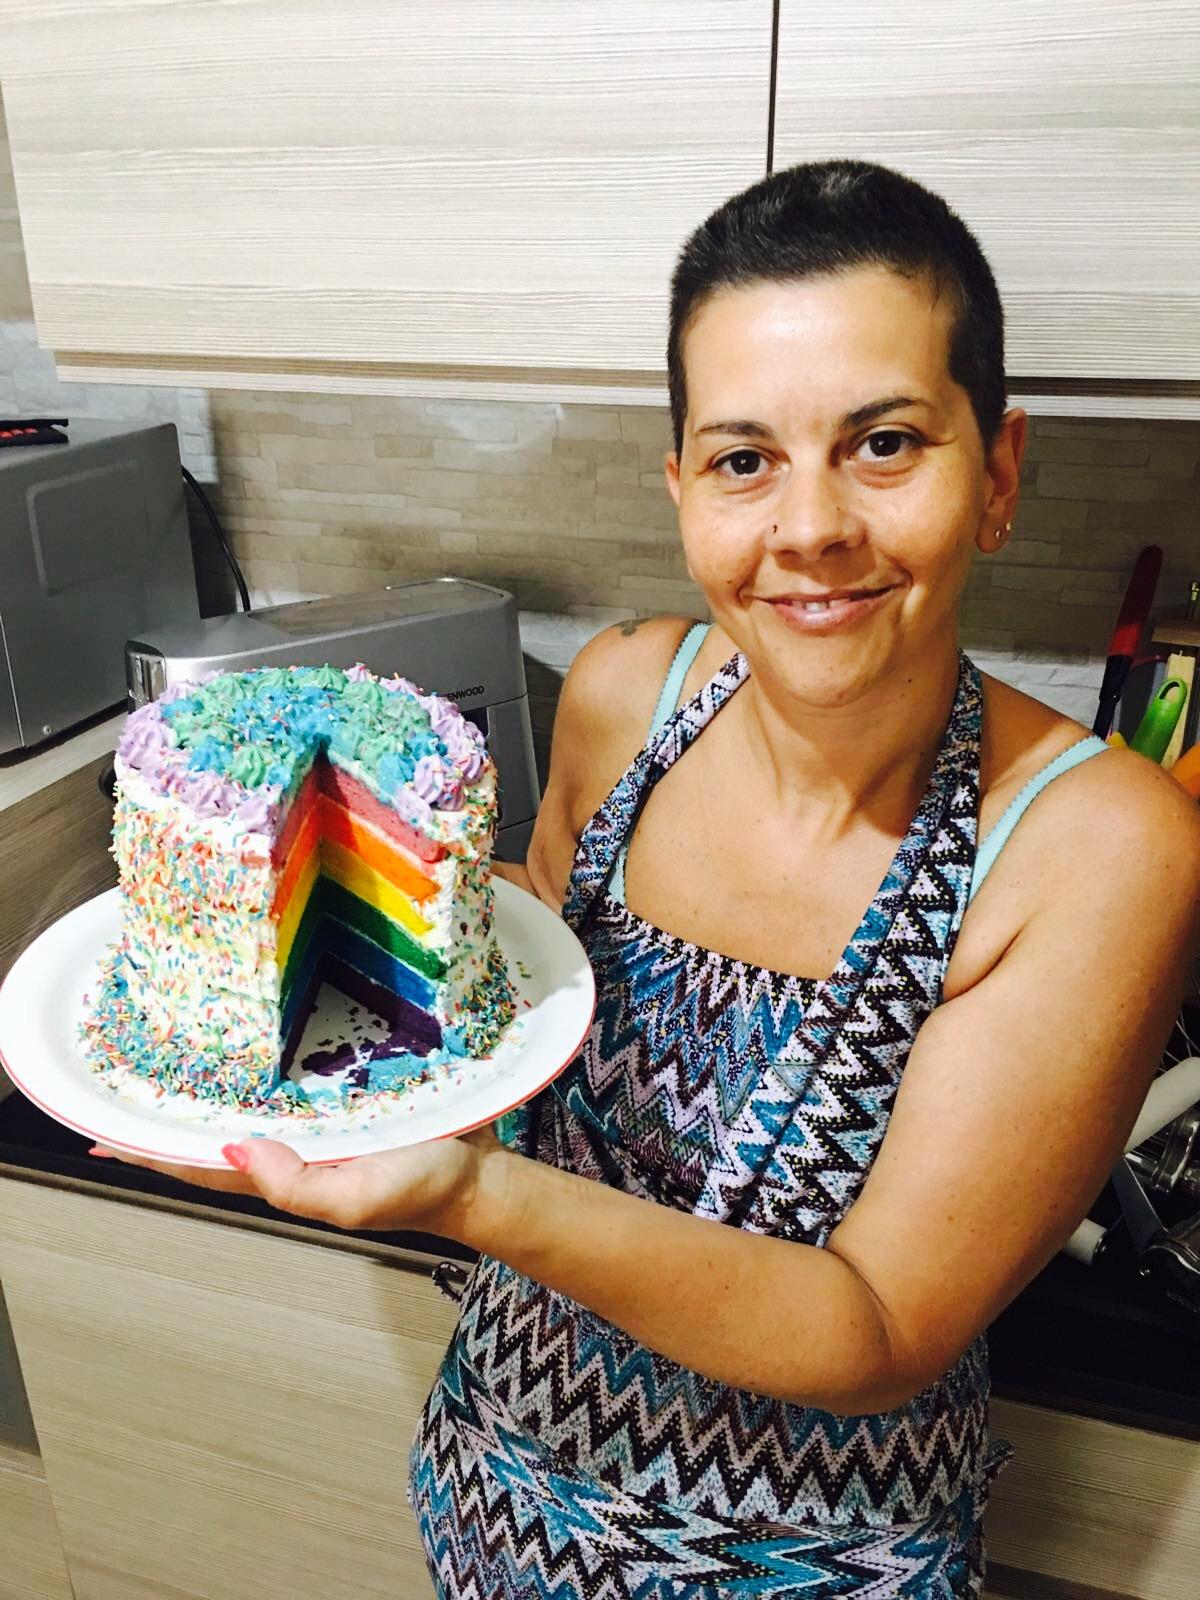 TORTA ARCOBALENO (rainbow cake)